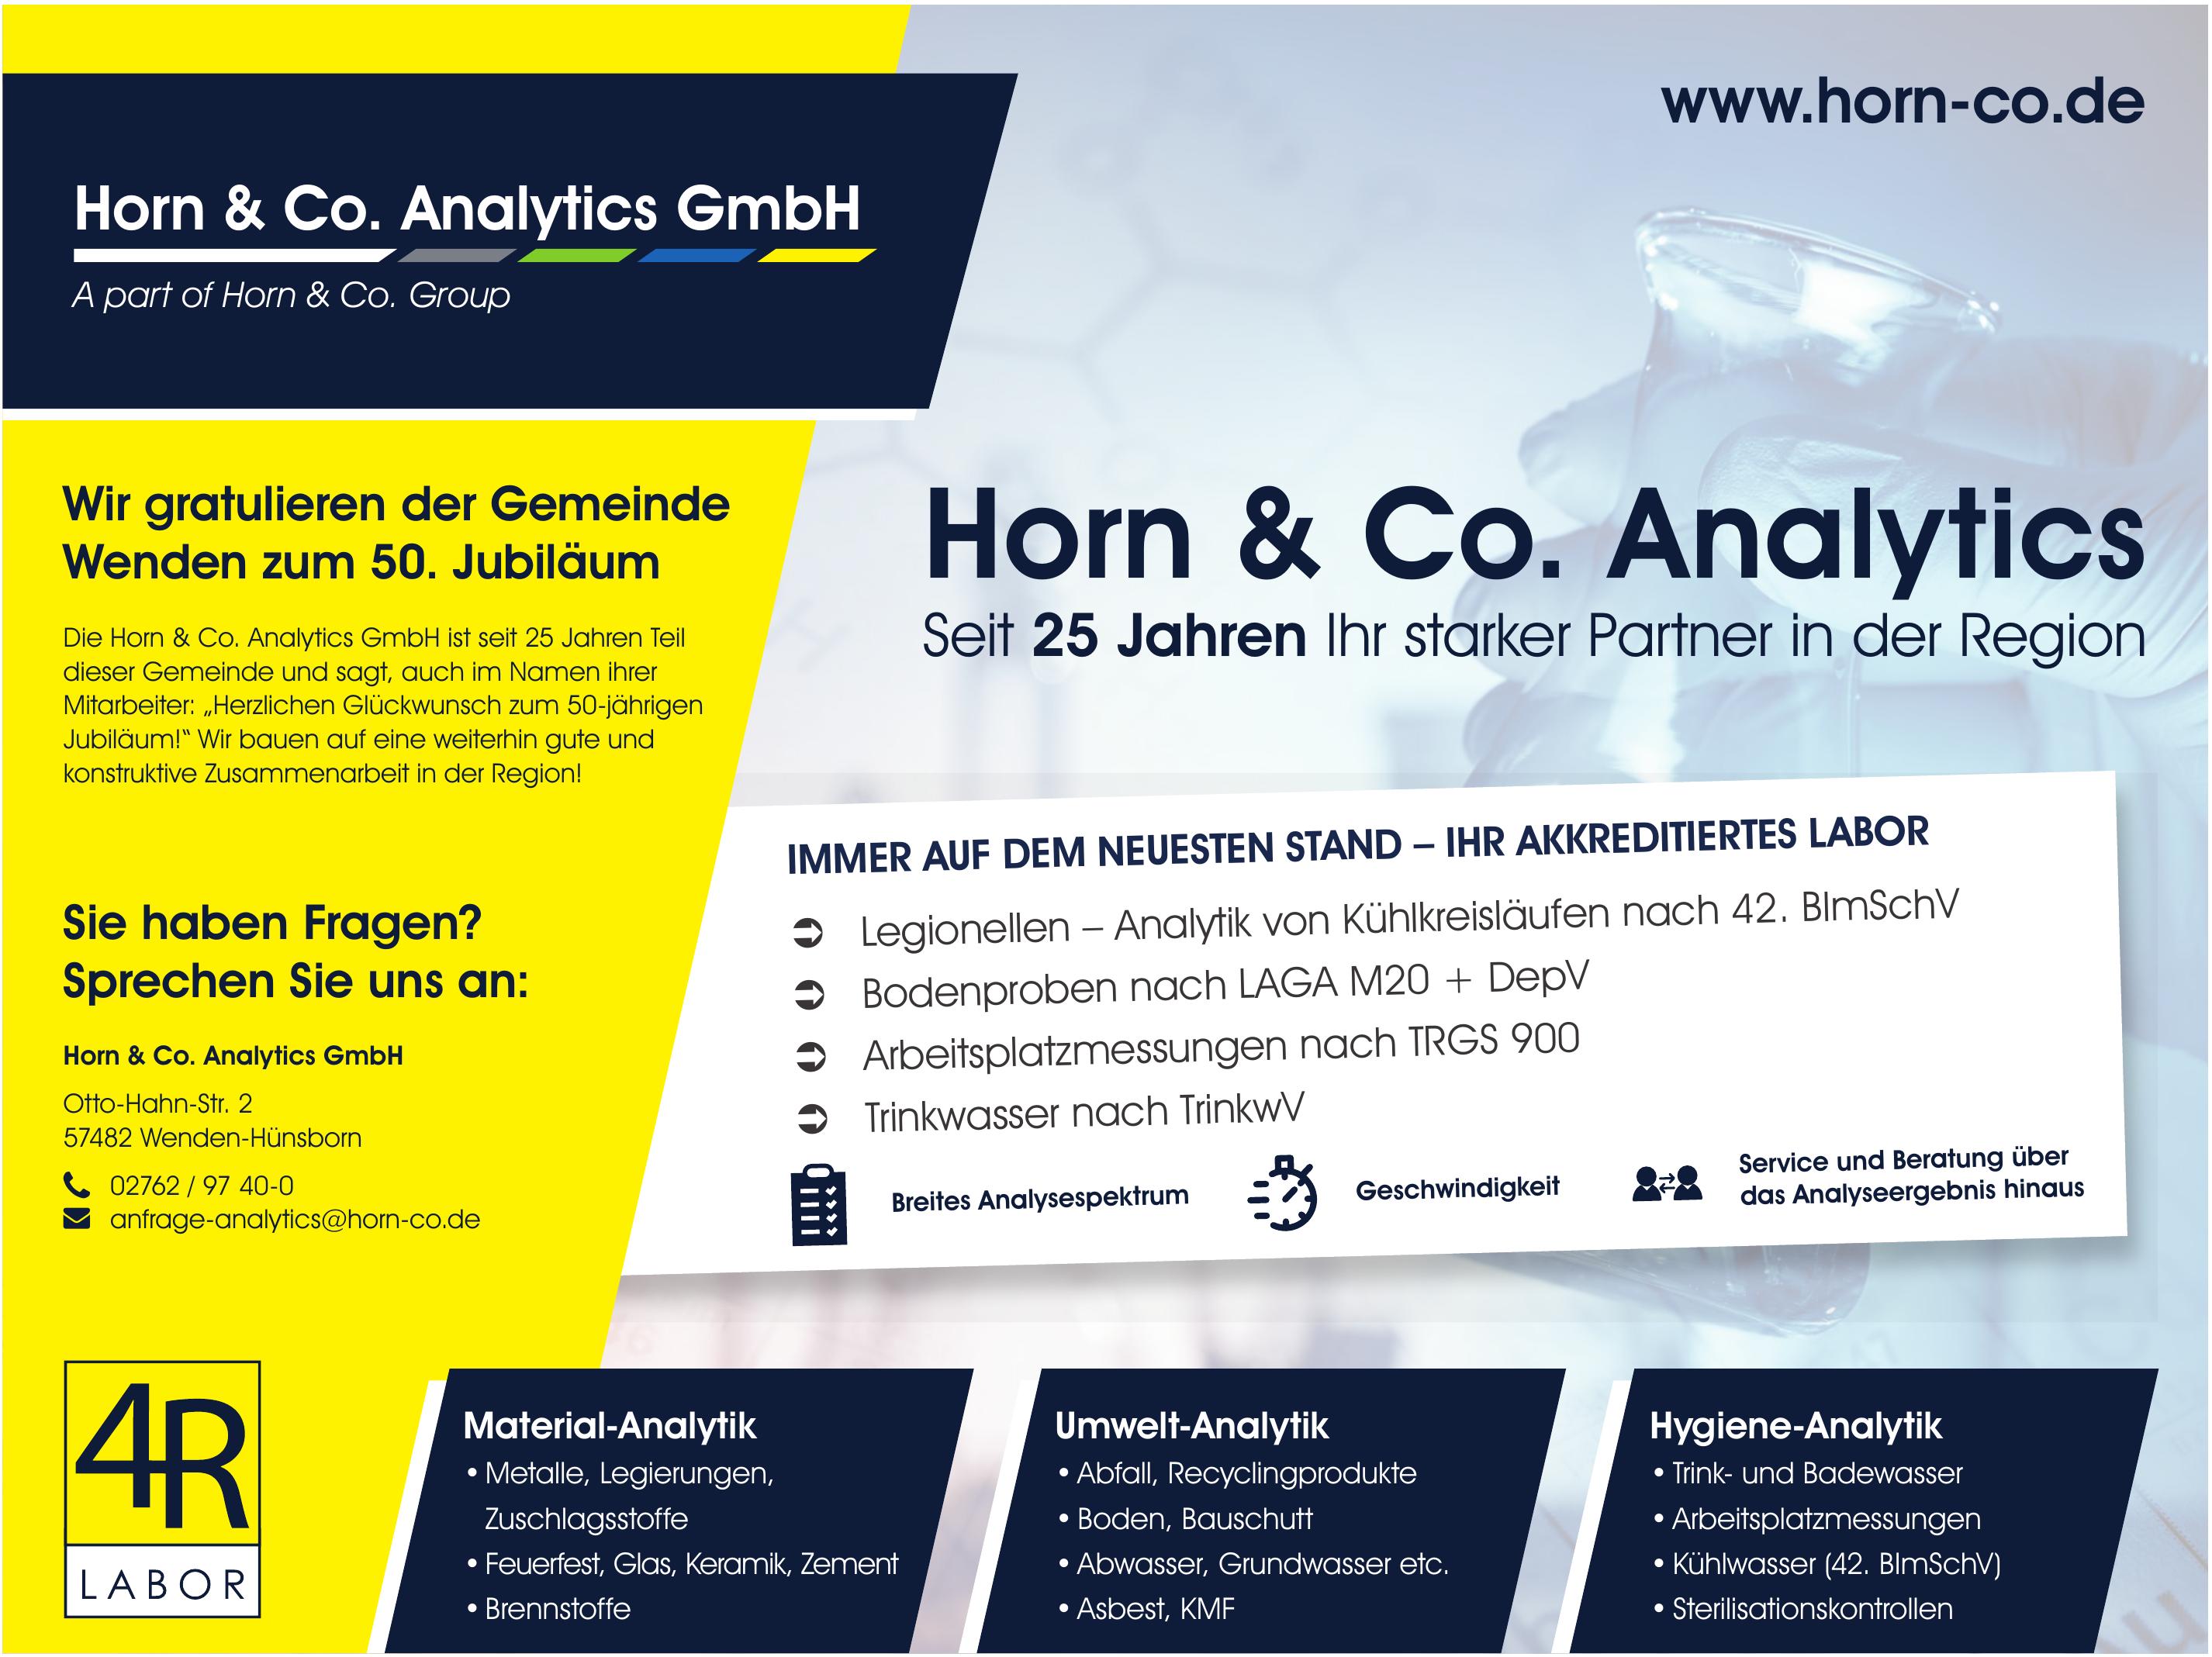 Horn & Co. Analytics GmbH